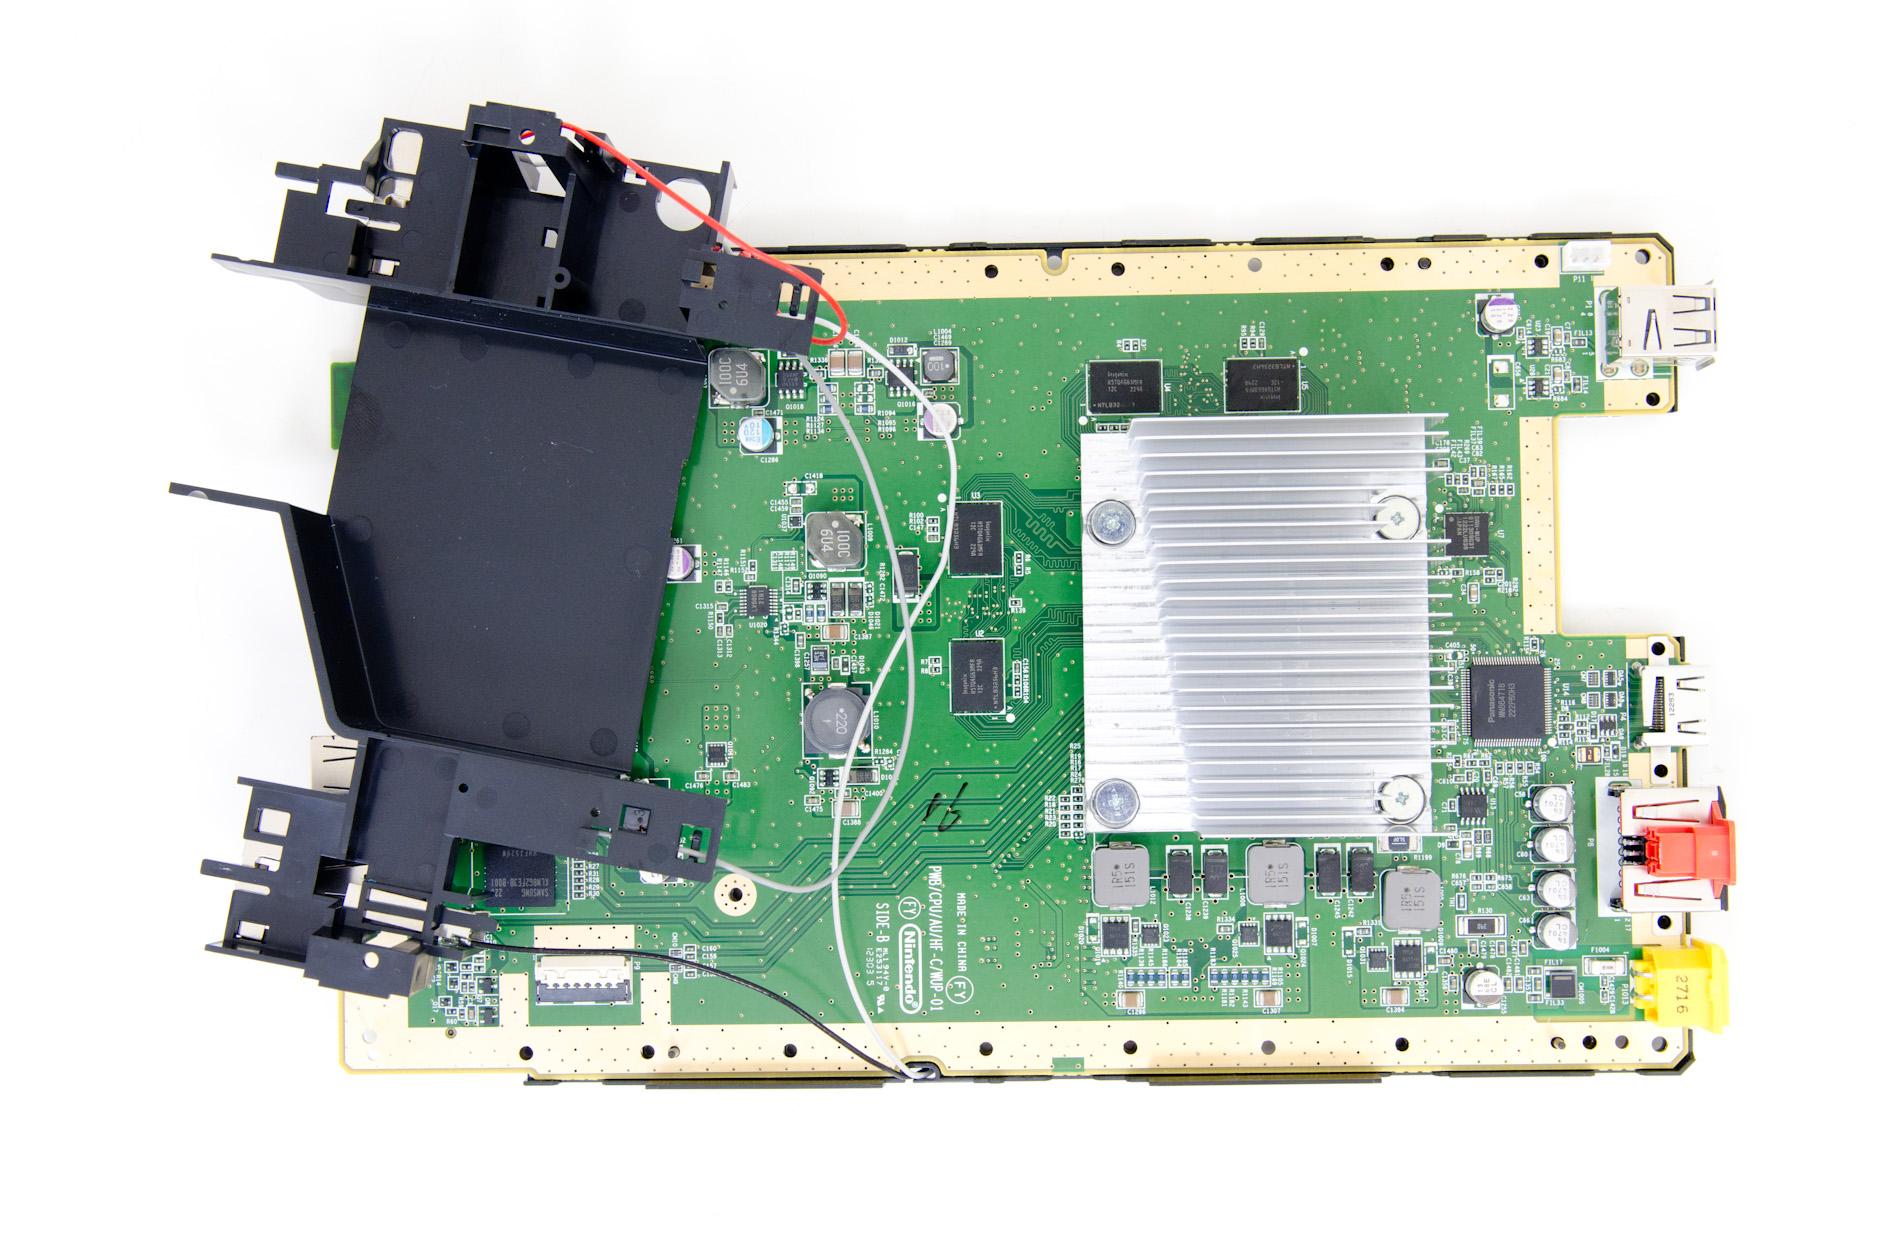 Nintendo Wii U Teardown | Wii U Motherboard Wiring Diagram |  | AnandTech